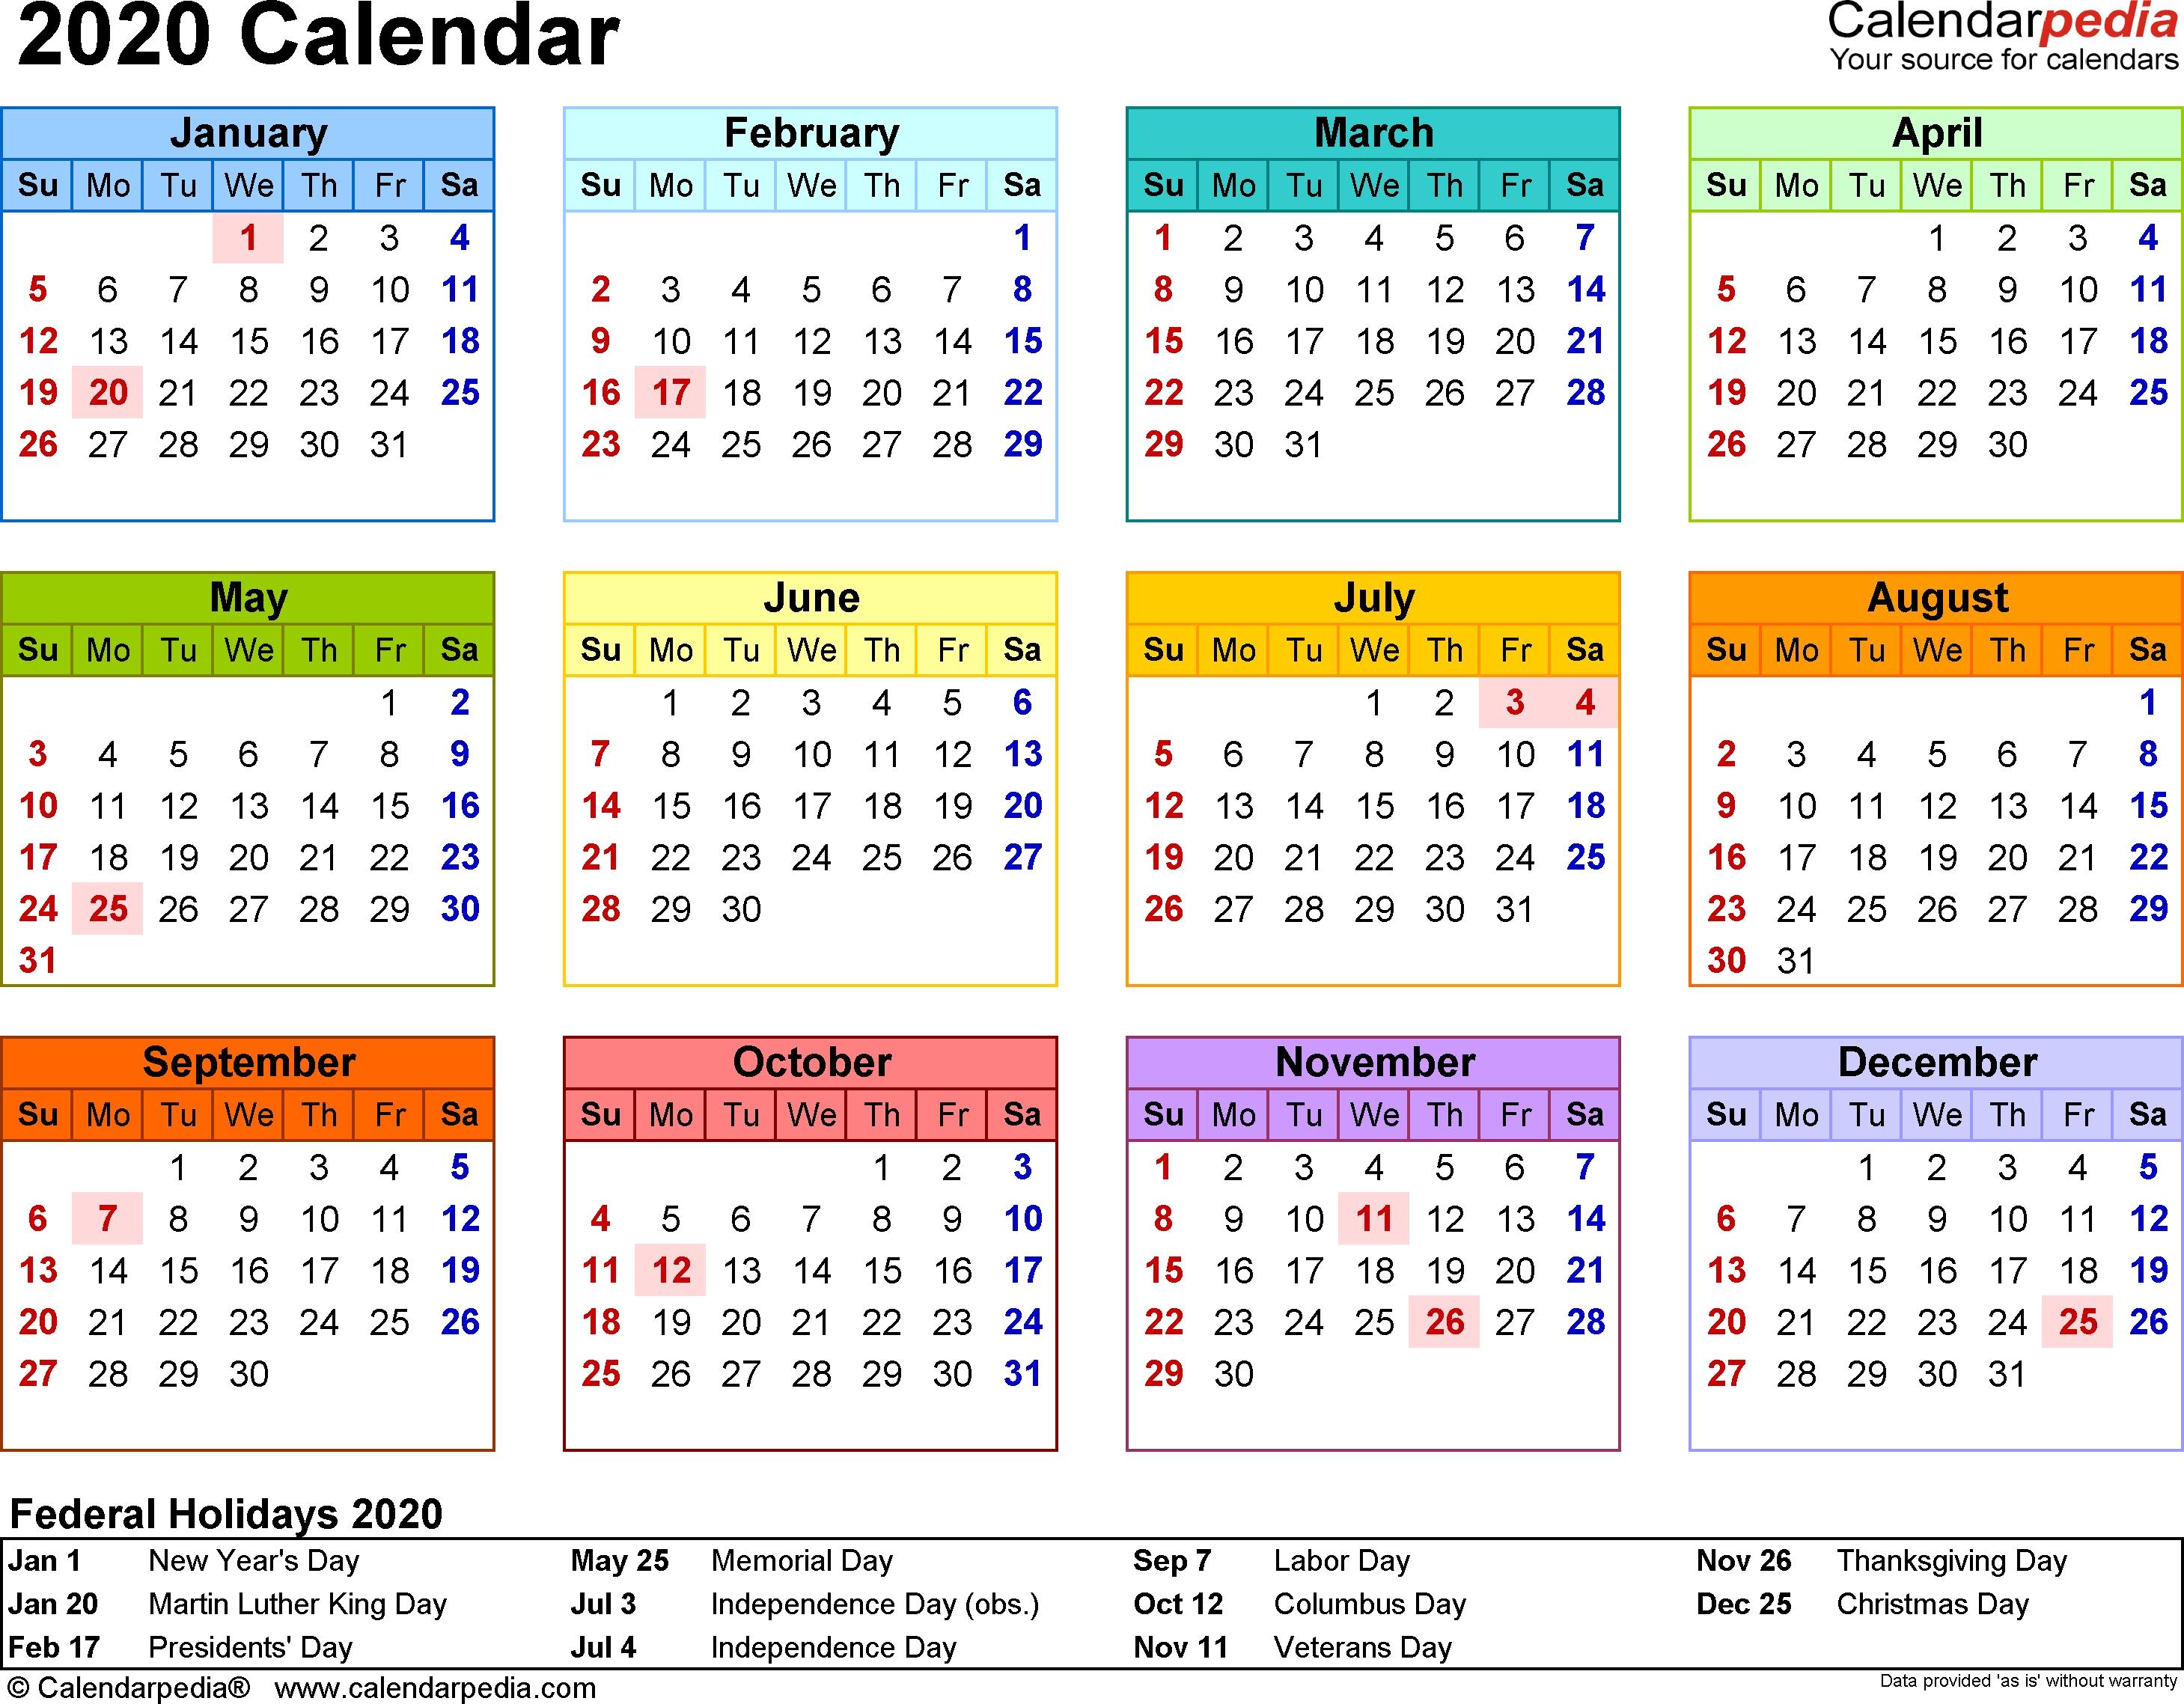 2020 Calendar - Download 18 Free Printable Excel Templates-January 2020 Calendar Kuda